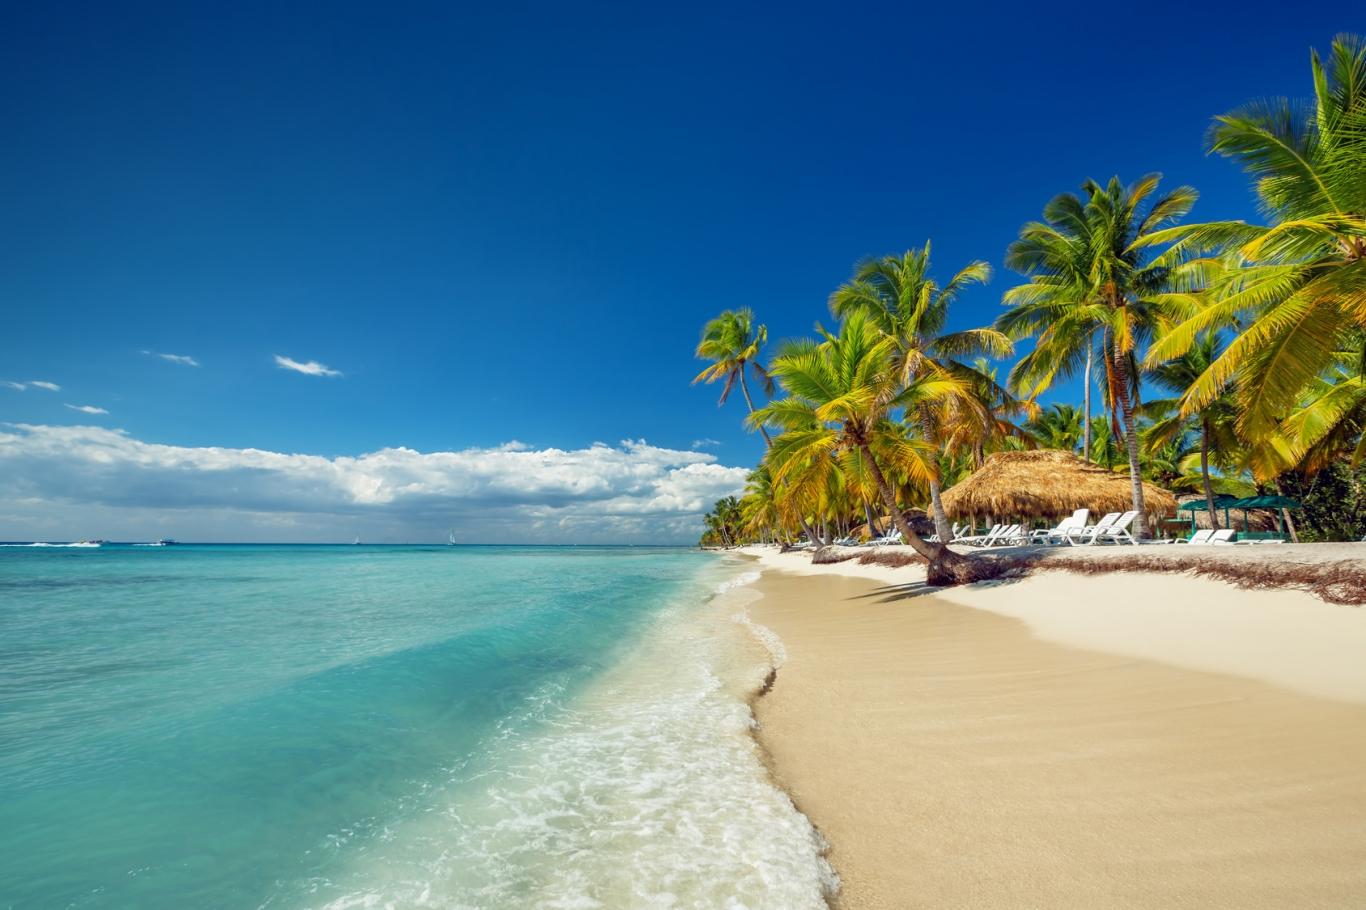 Centroamérica y Caribe -  - Smart Travel